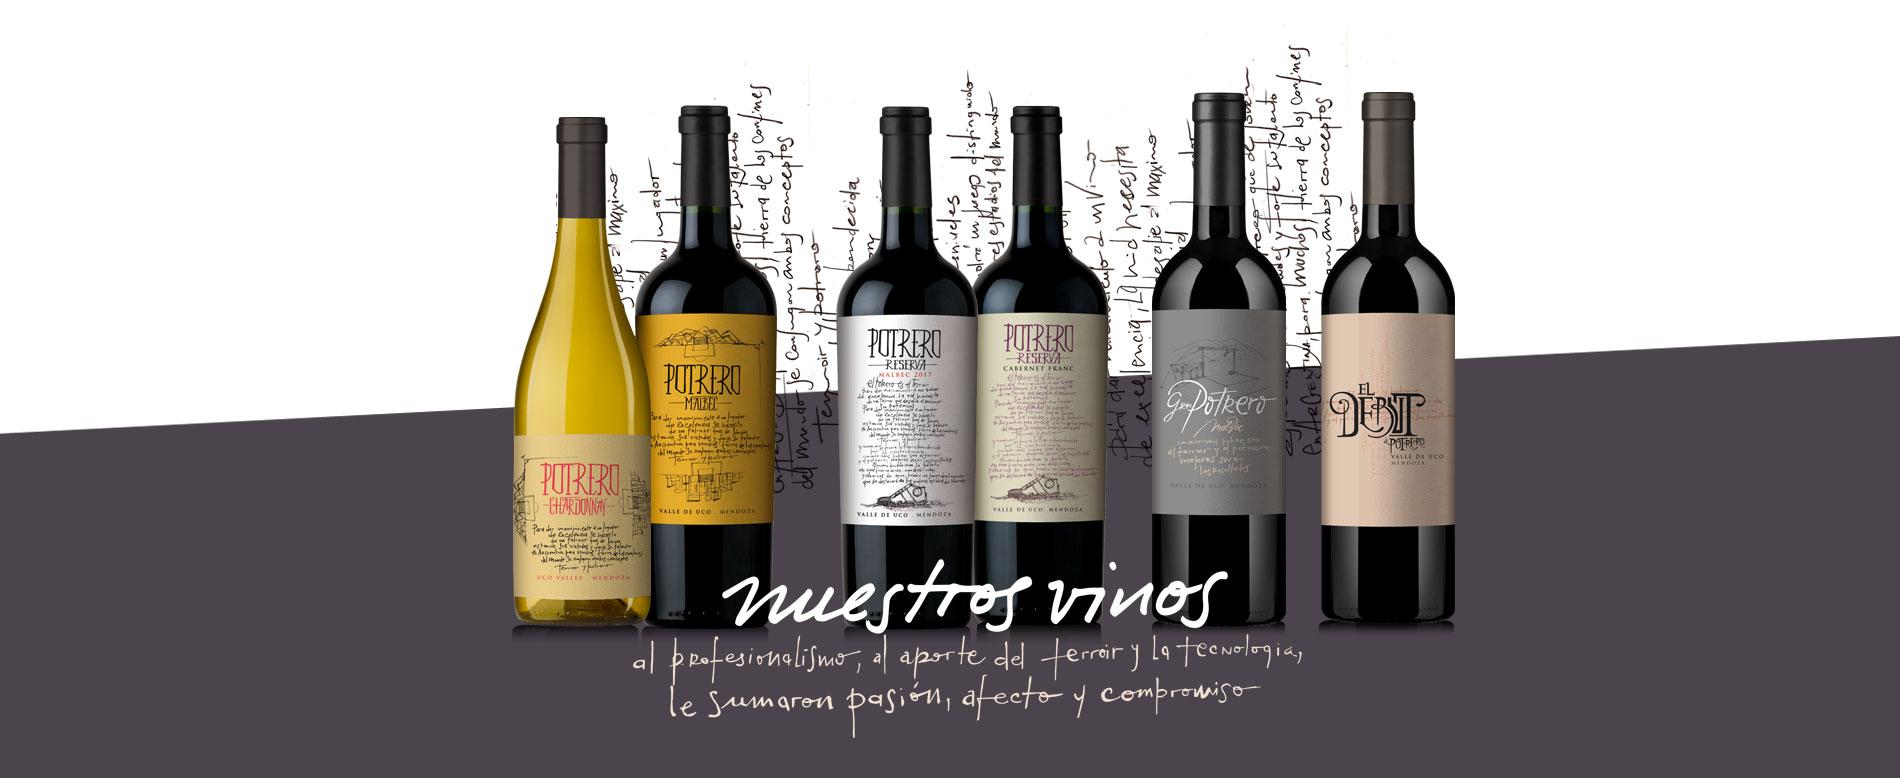 linea completa de vinos de potrero